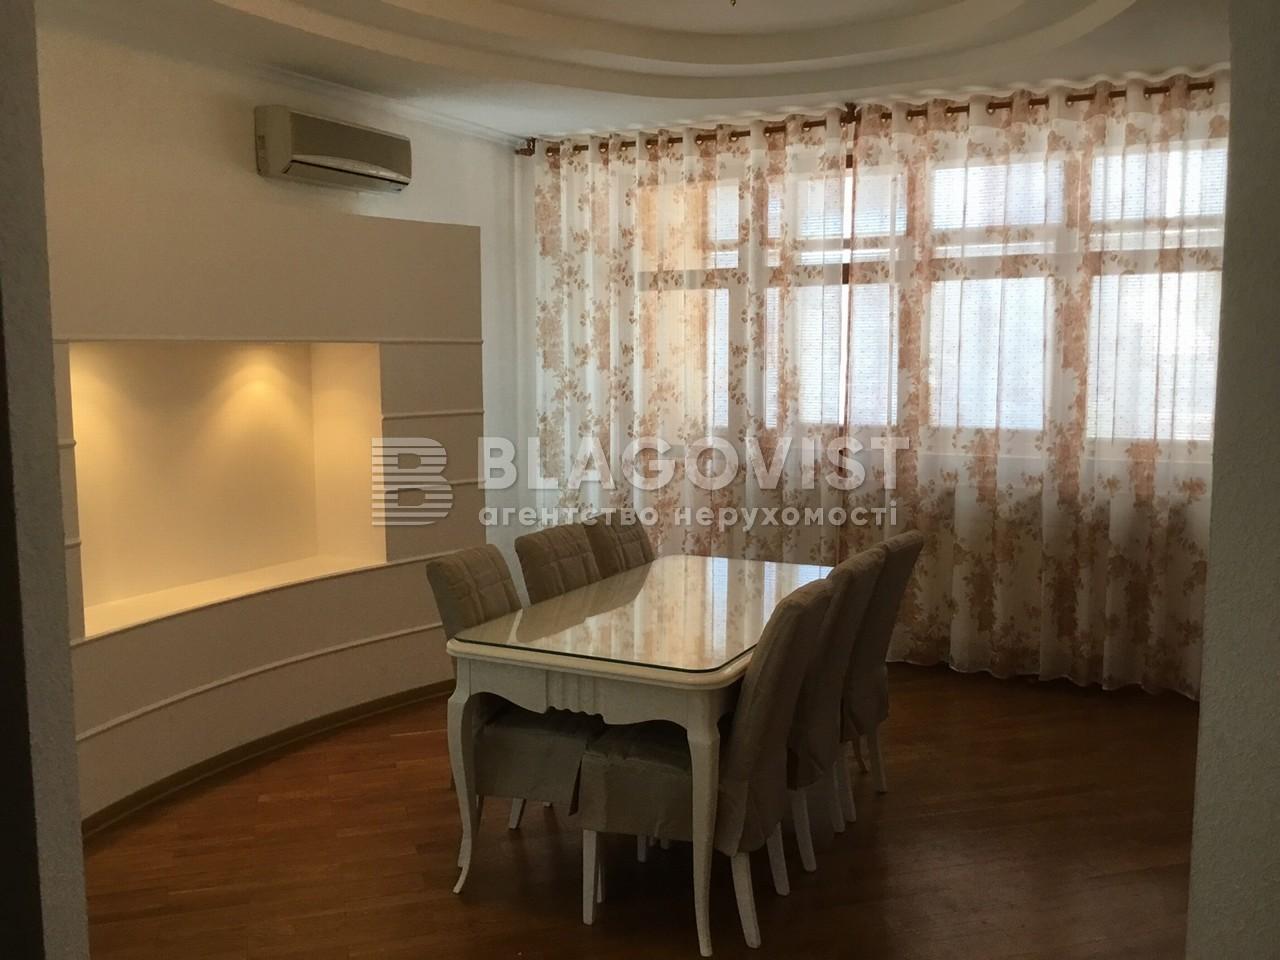 Квартира C-72808, Павловская, 18, Киев - Фото 14